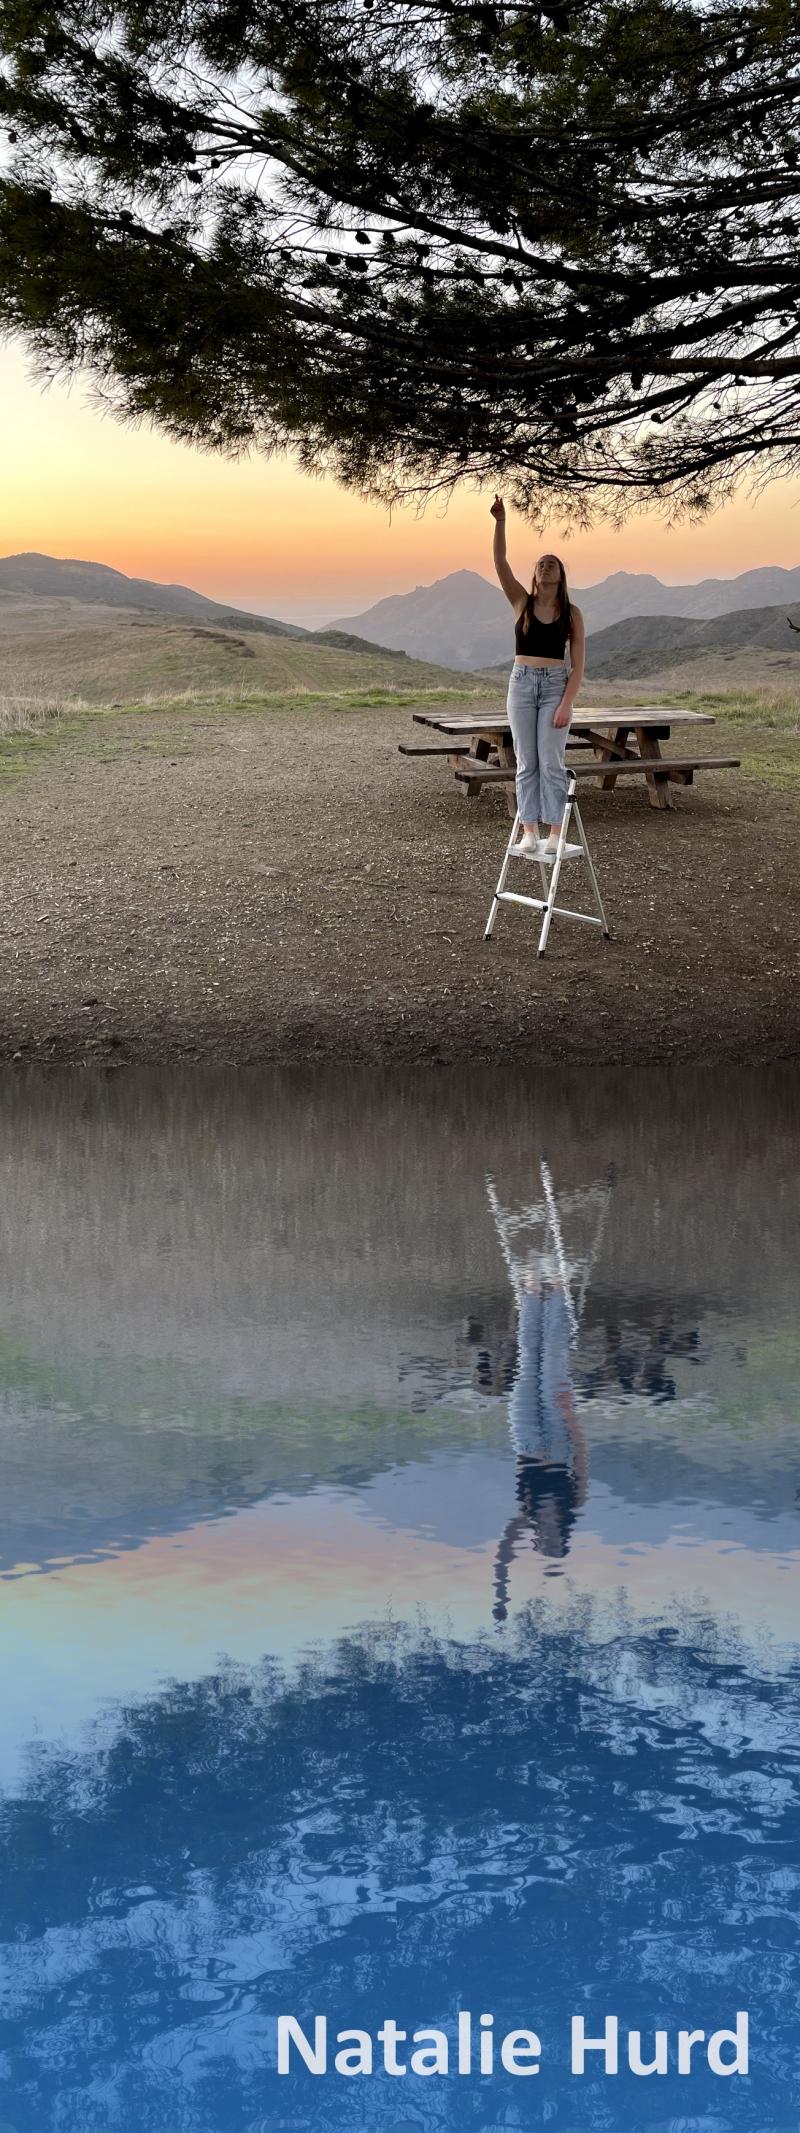 Natalie-Hurd-Reflection